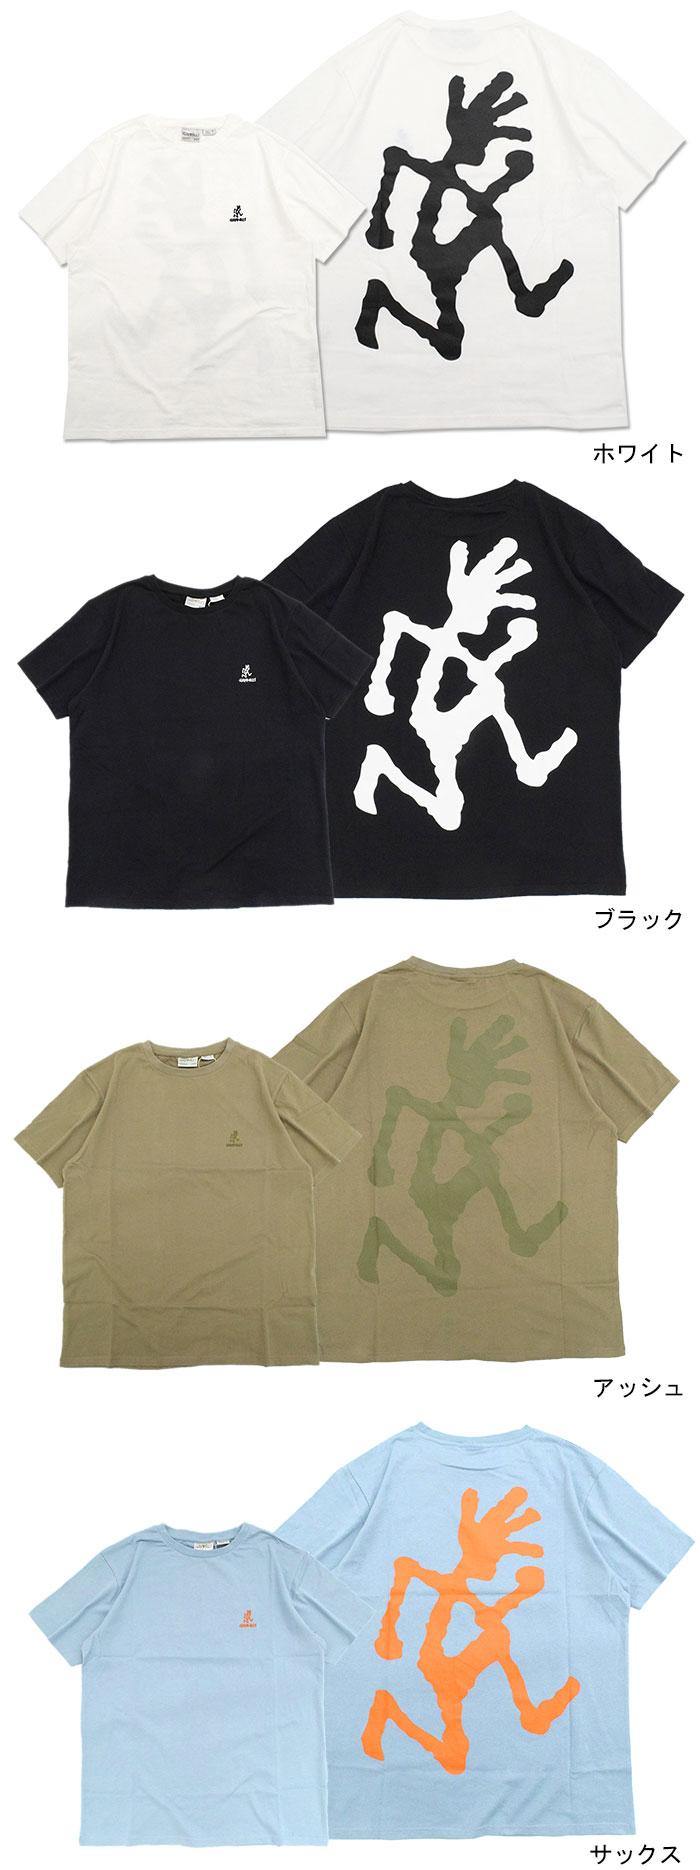 GRAMICCIグラミチのTシャツ Big Runningman07